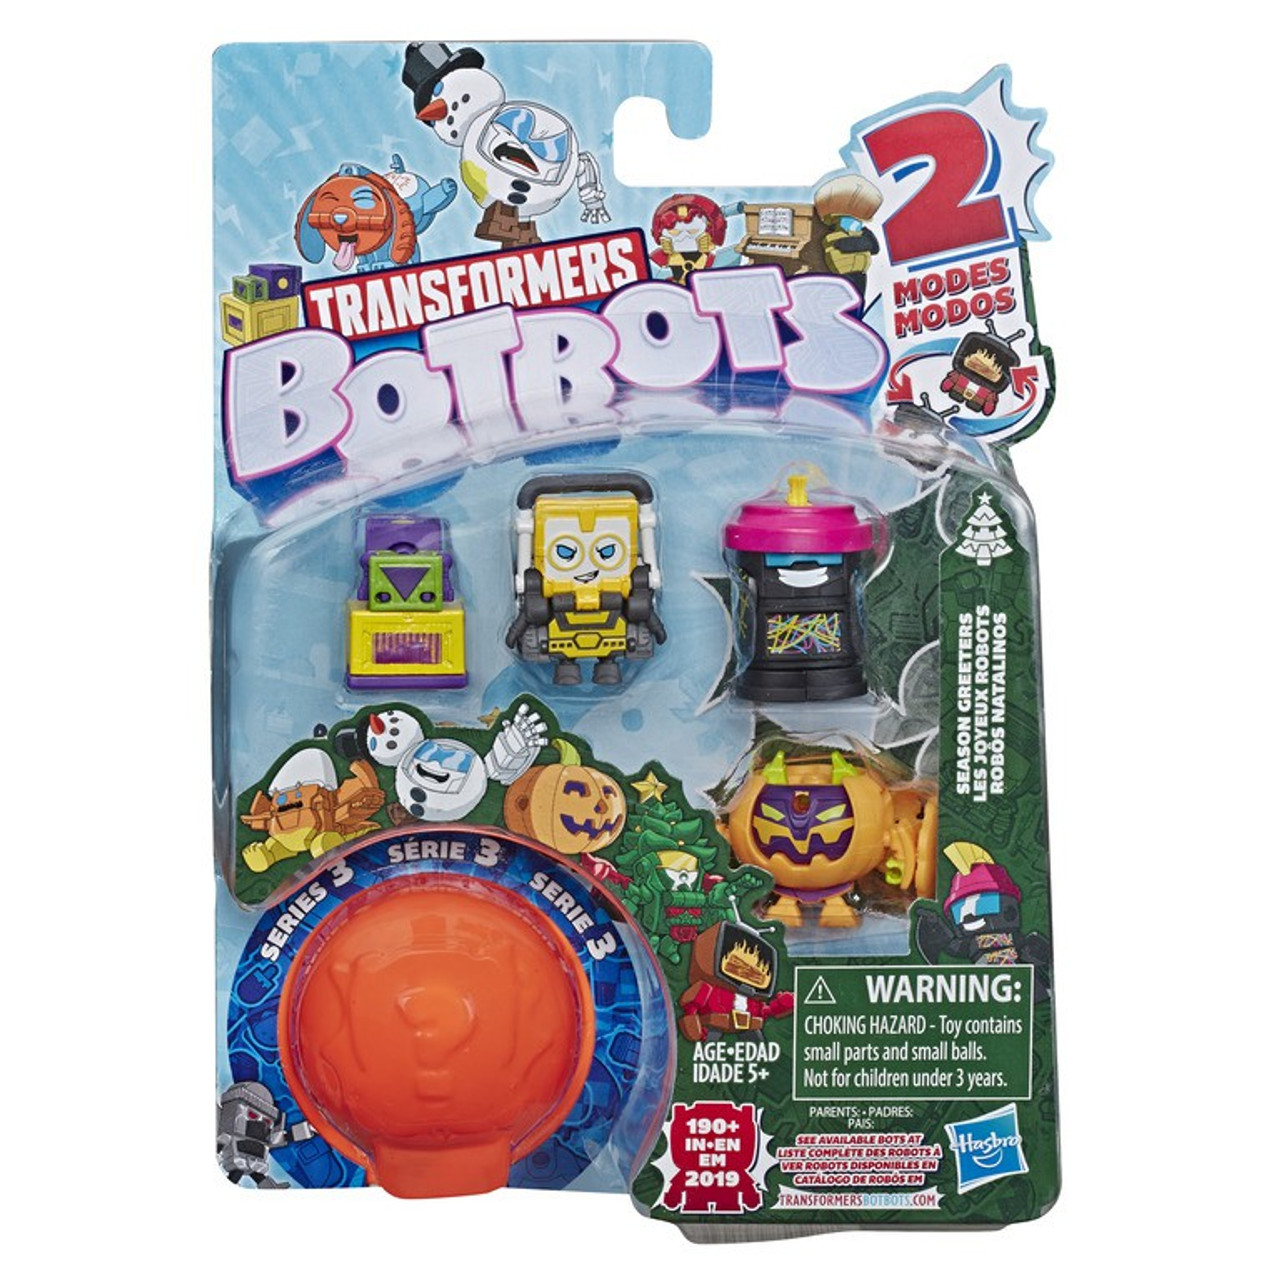 Lost Bots Loose Transformers BotBots Series 2 Love Struck